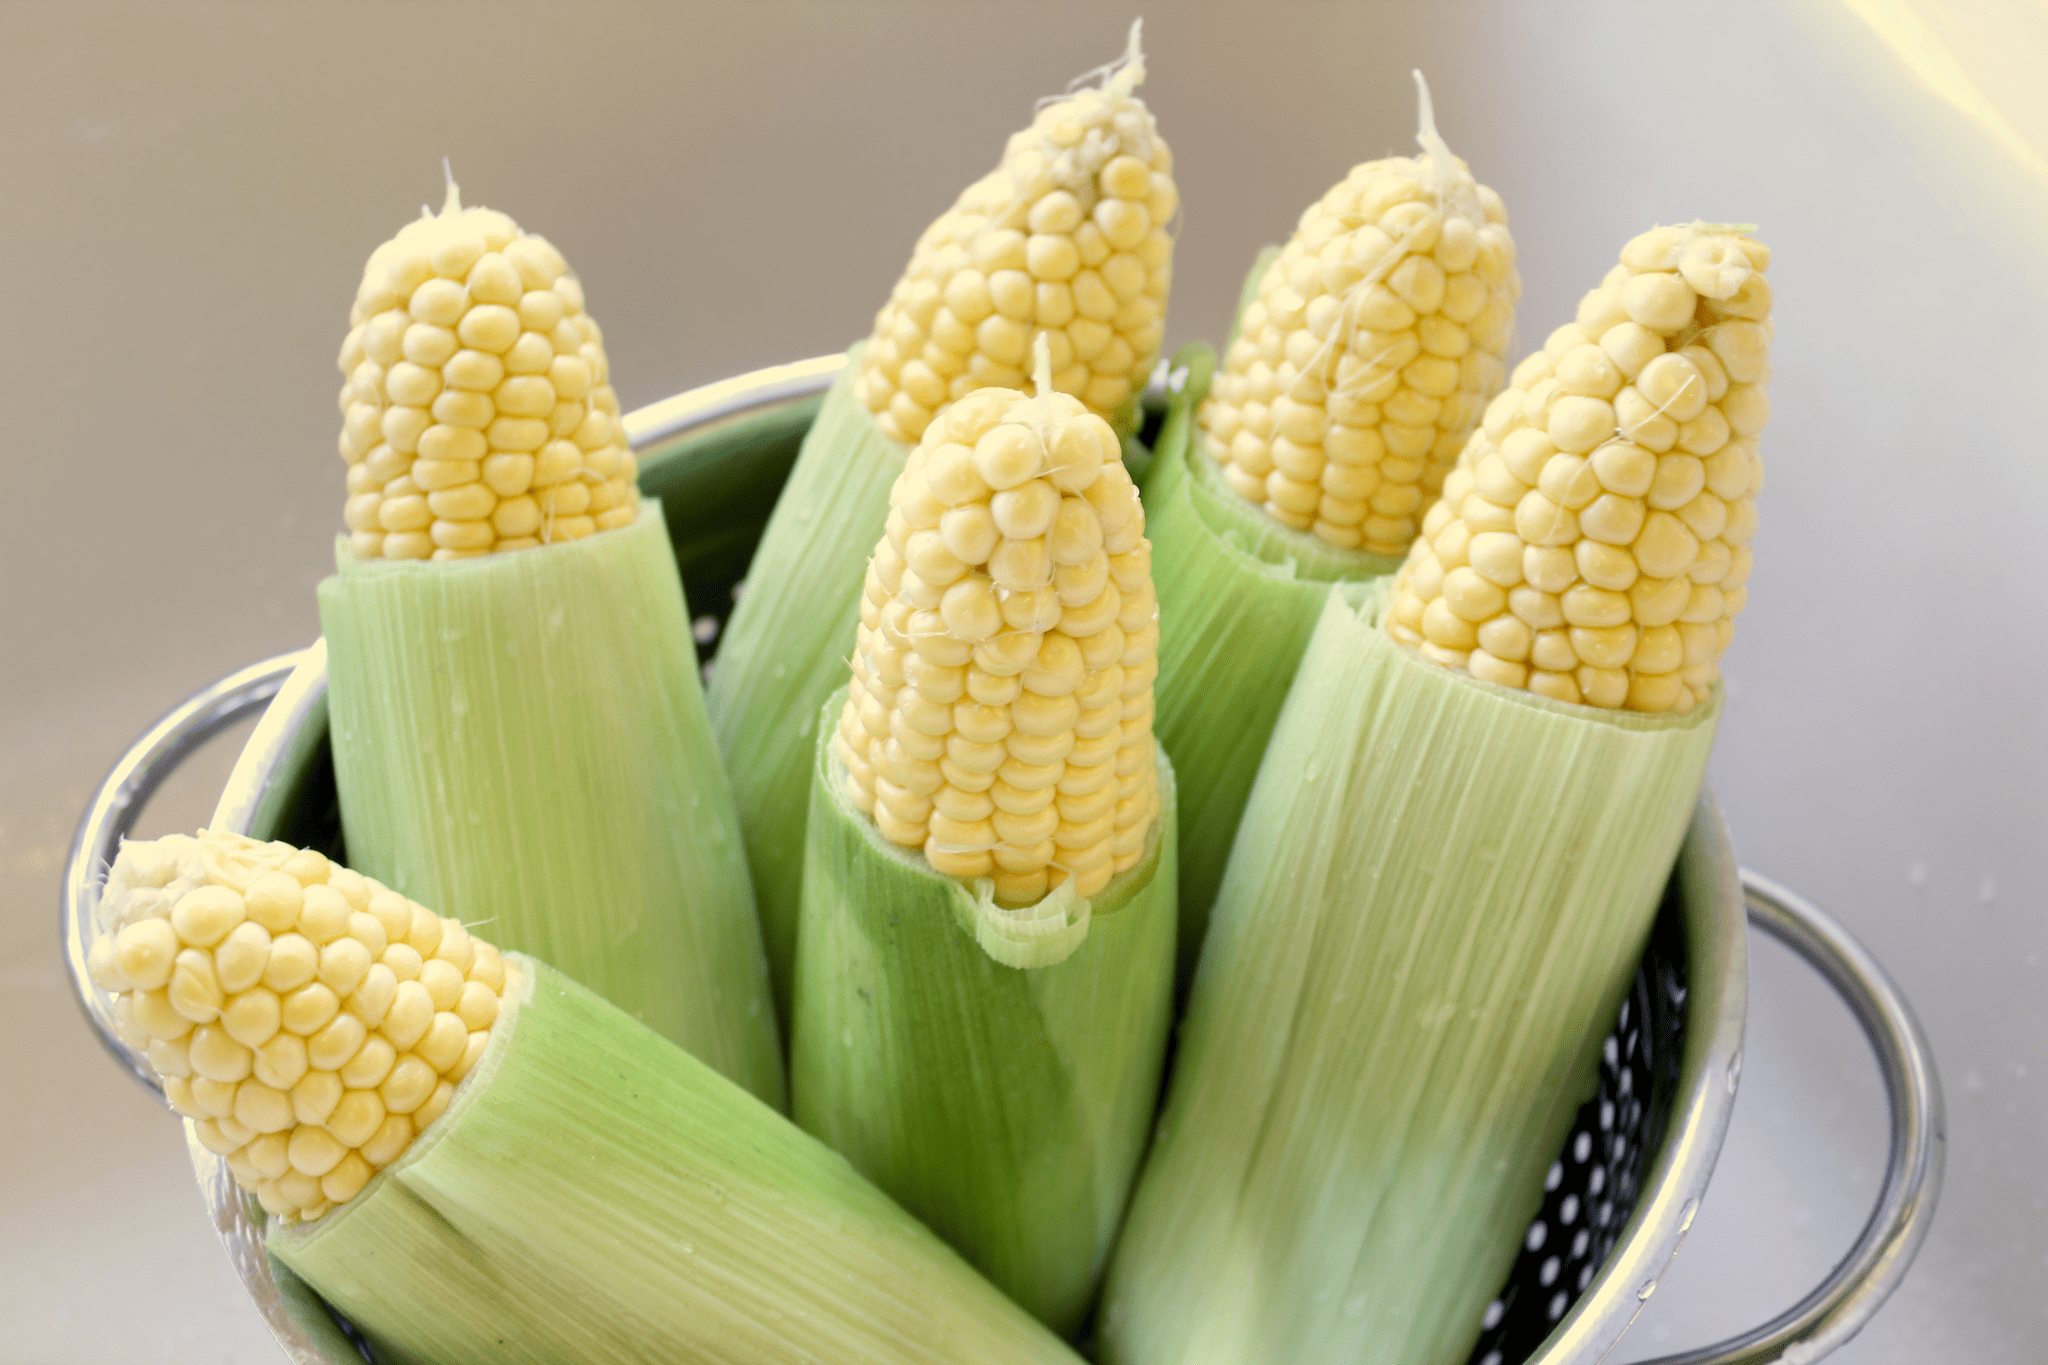 Guy Fieri's Transformative Way to Grill Corn